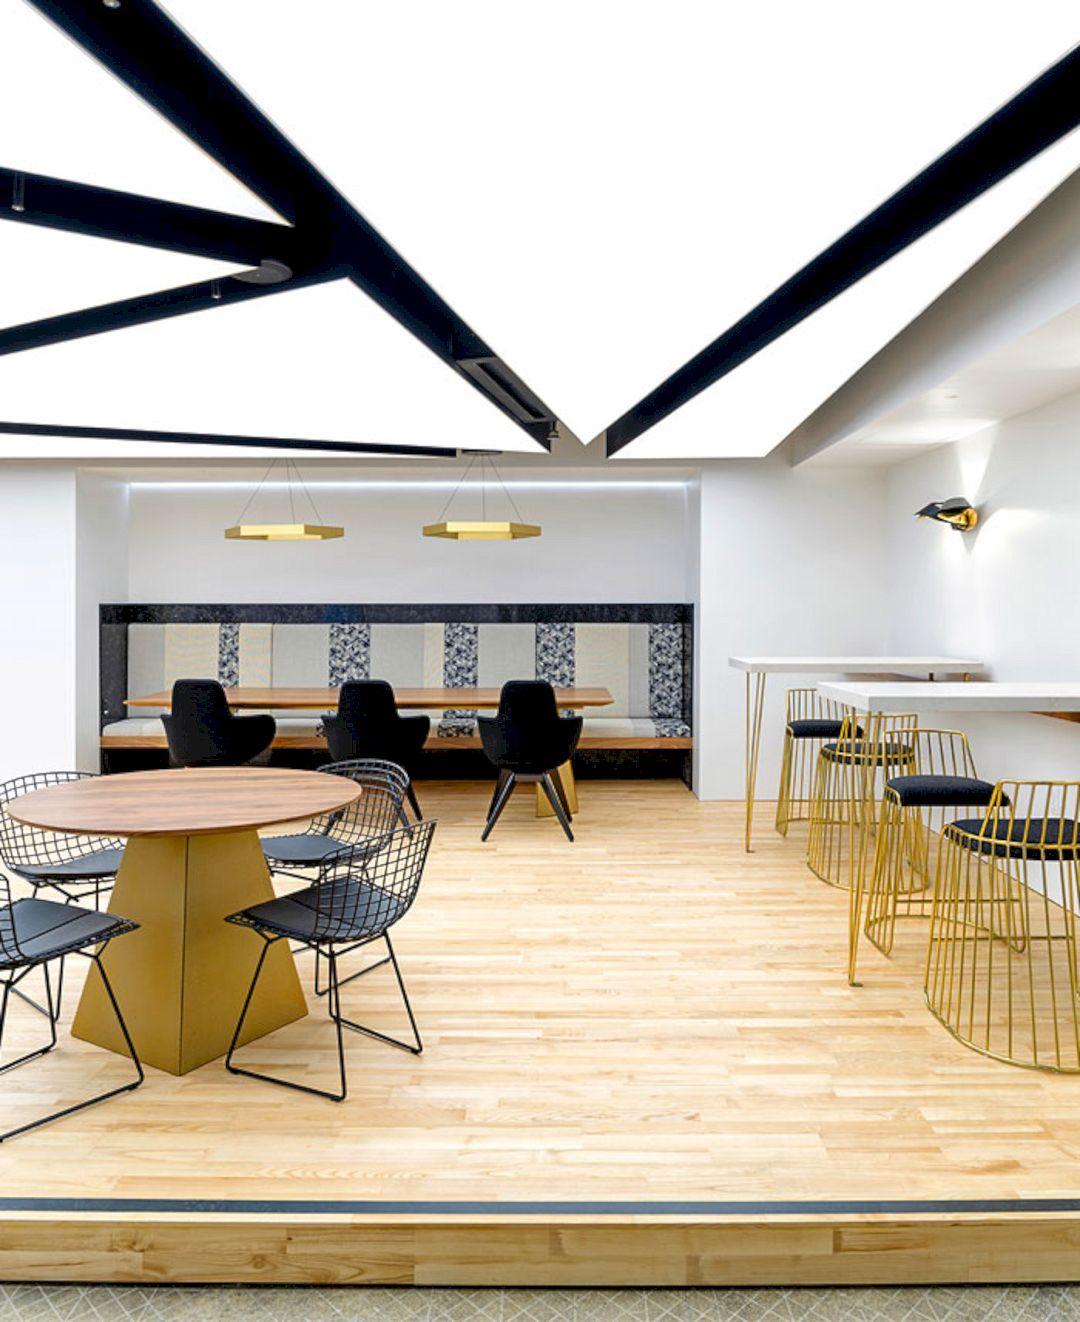 Attirant Best Modern And Gorgeous Office Interior Design Ideas  Https://www.futuristarchitecture.com/23070 Office Interior.html